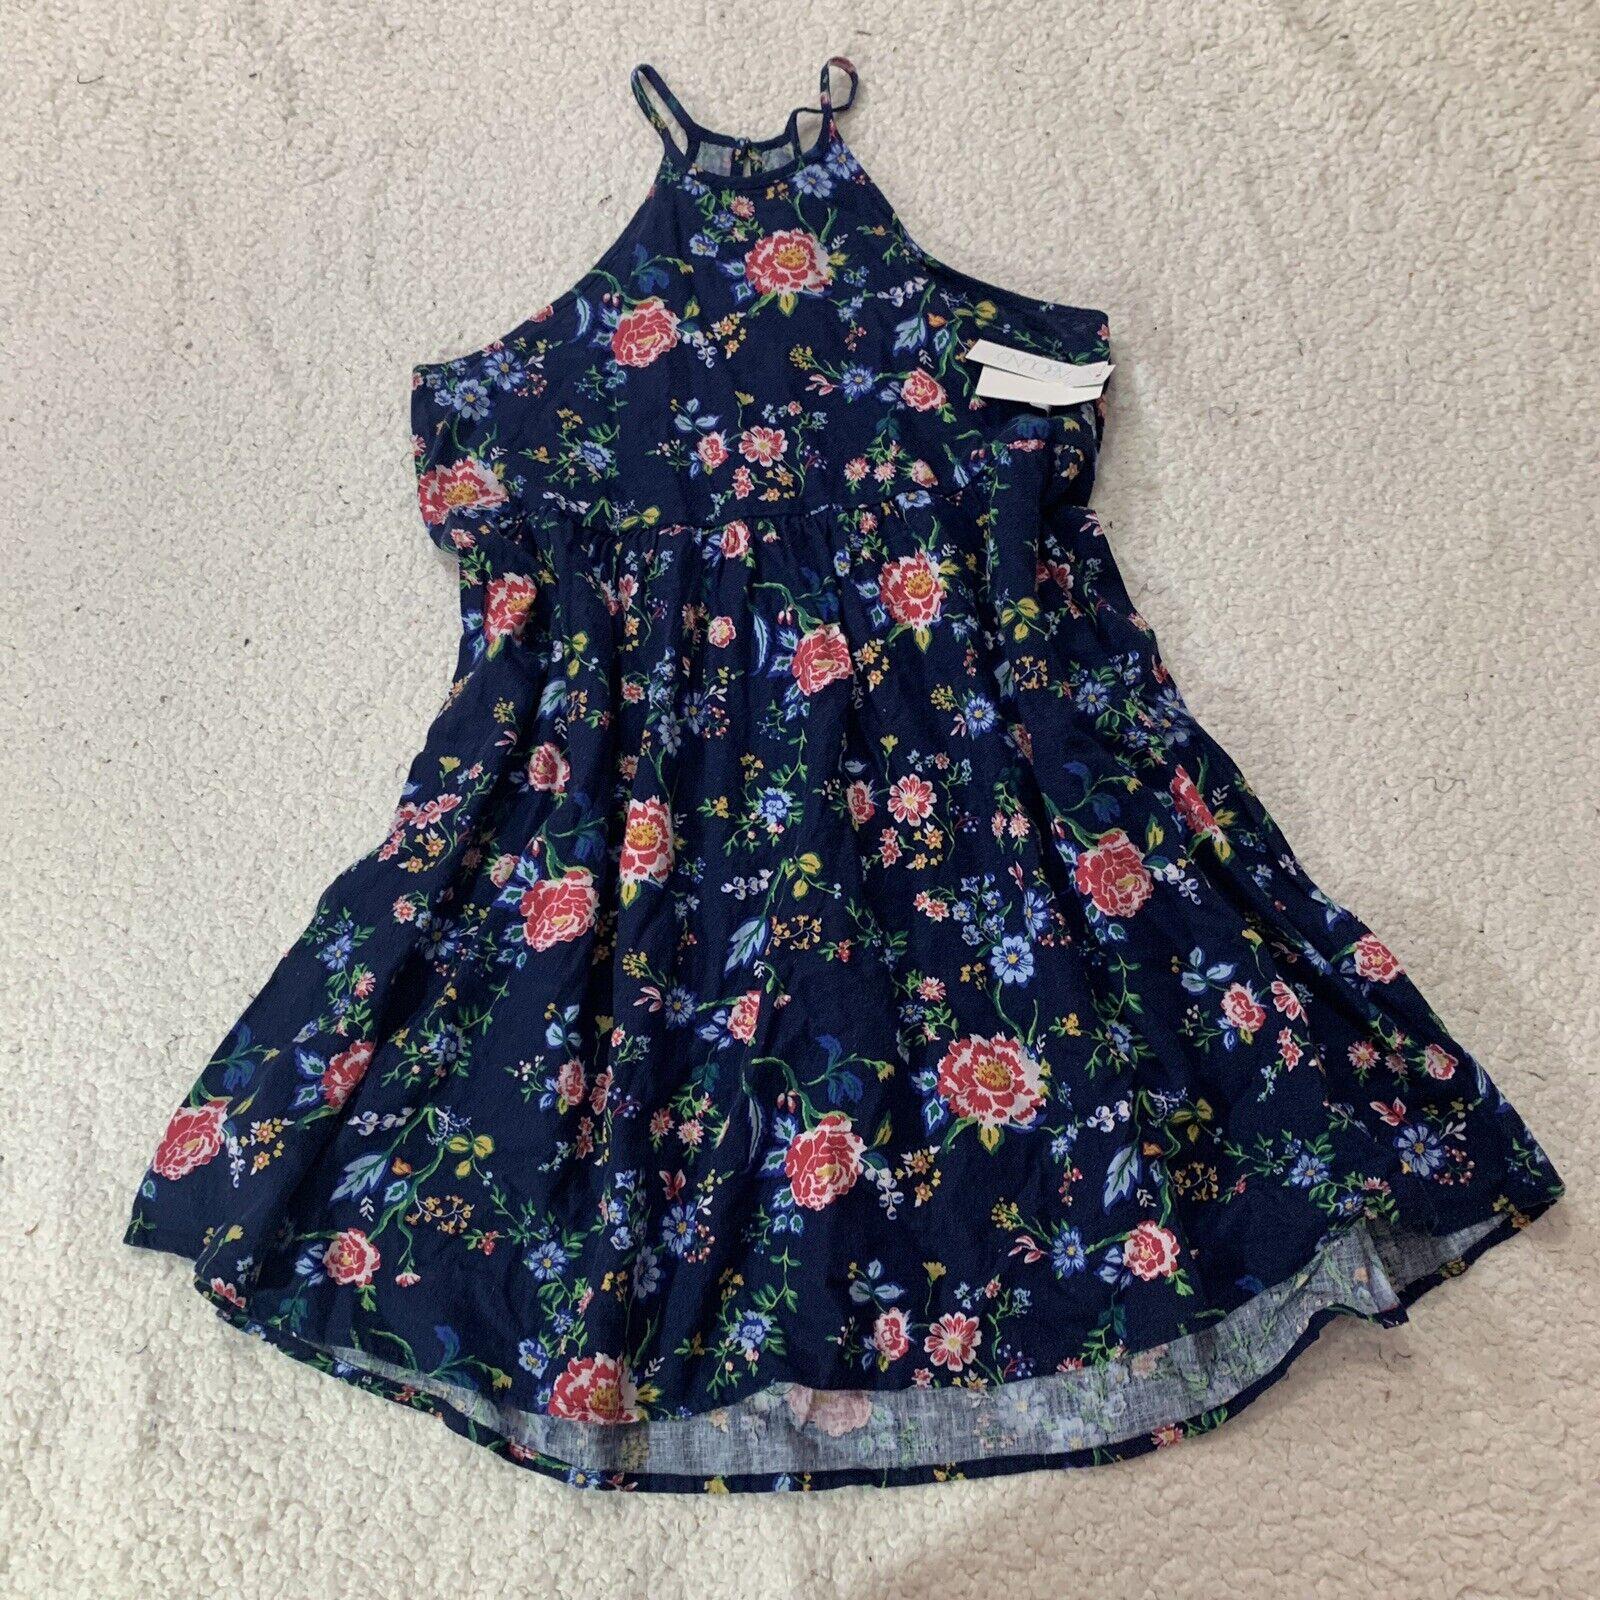 Abound For Nordstrom Womens Dress Linen Blend Floral Sleeveless Size Medium M